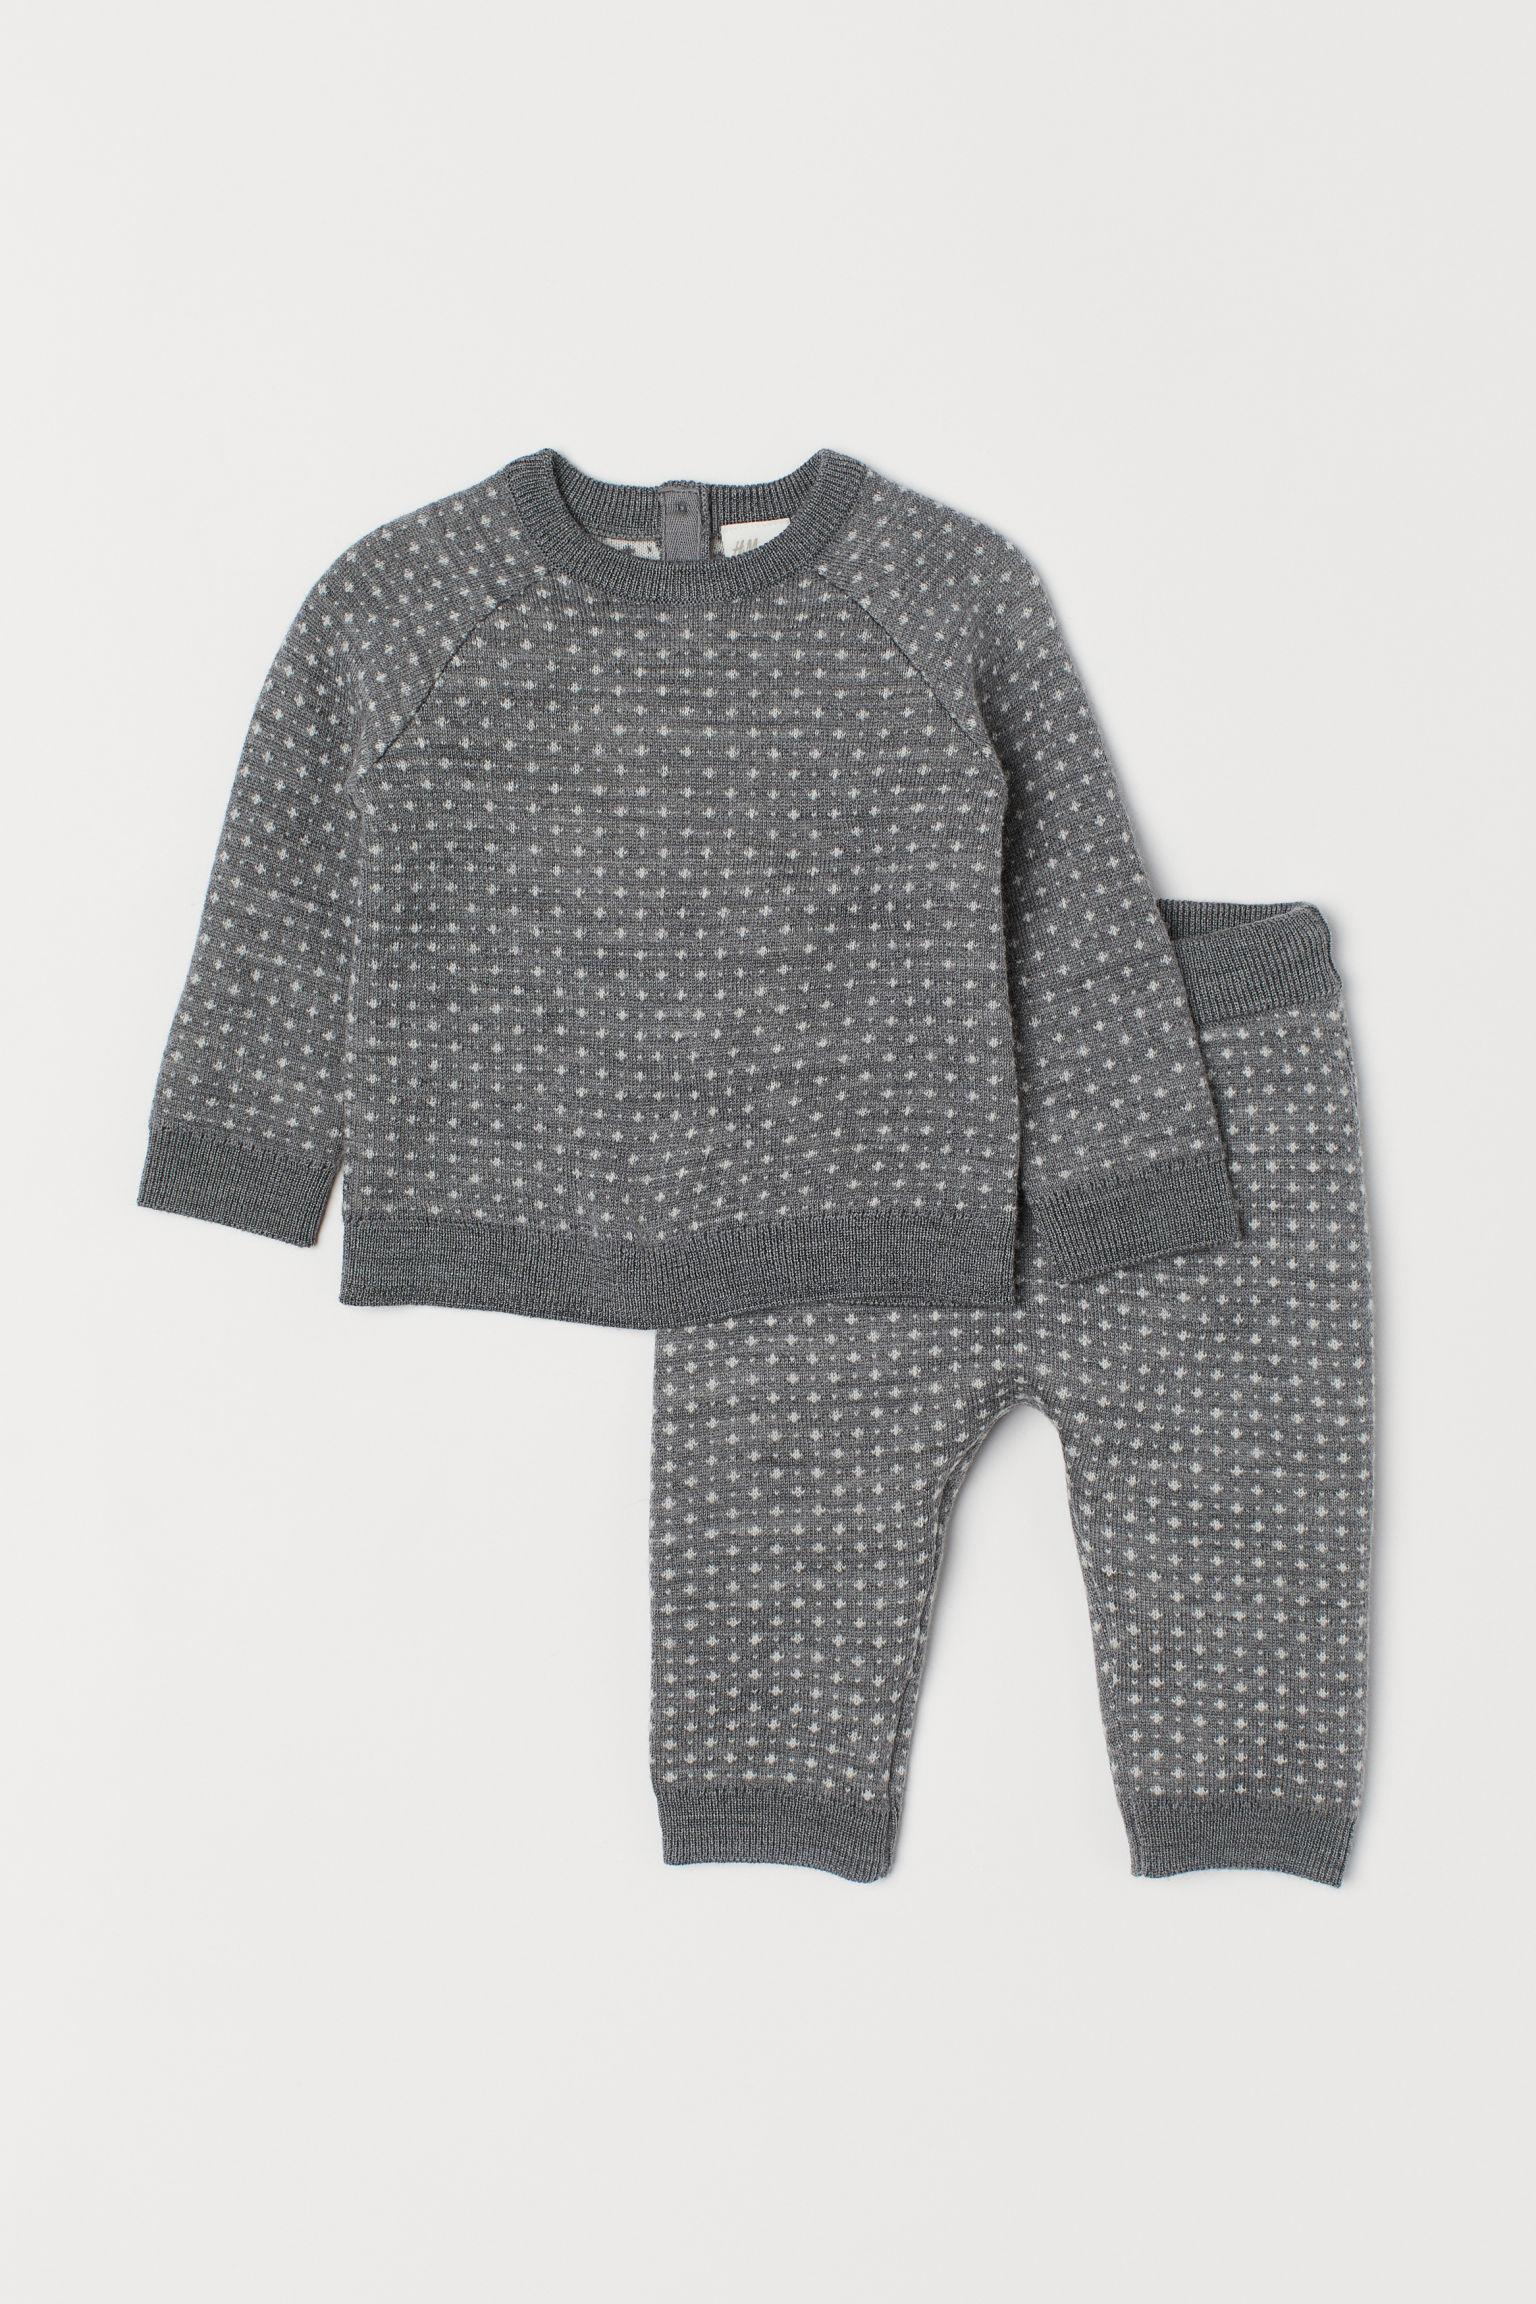 ce51b8b5 Black Sweater Grey Dress Pants   Huston Fislar Photography